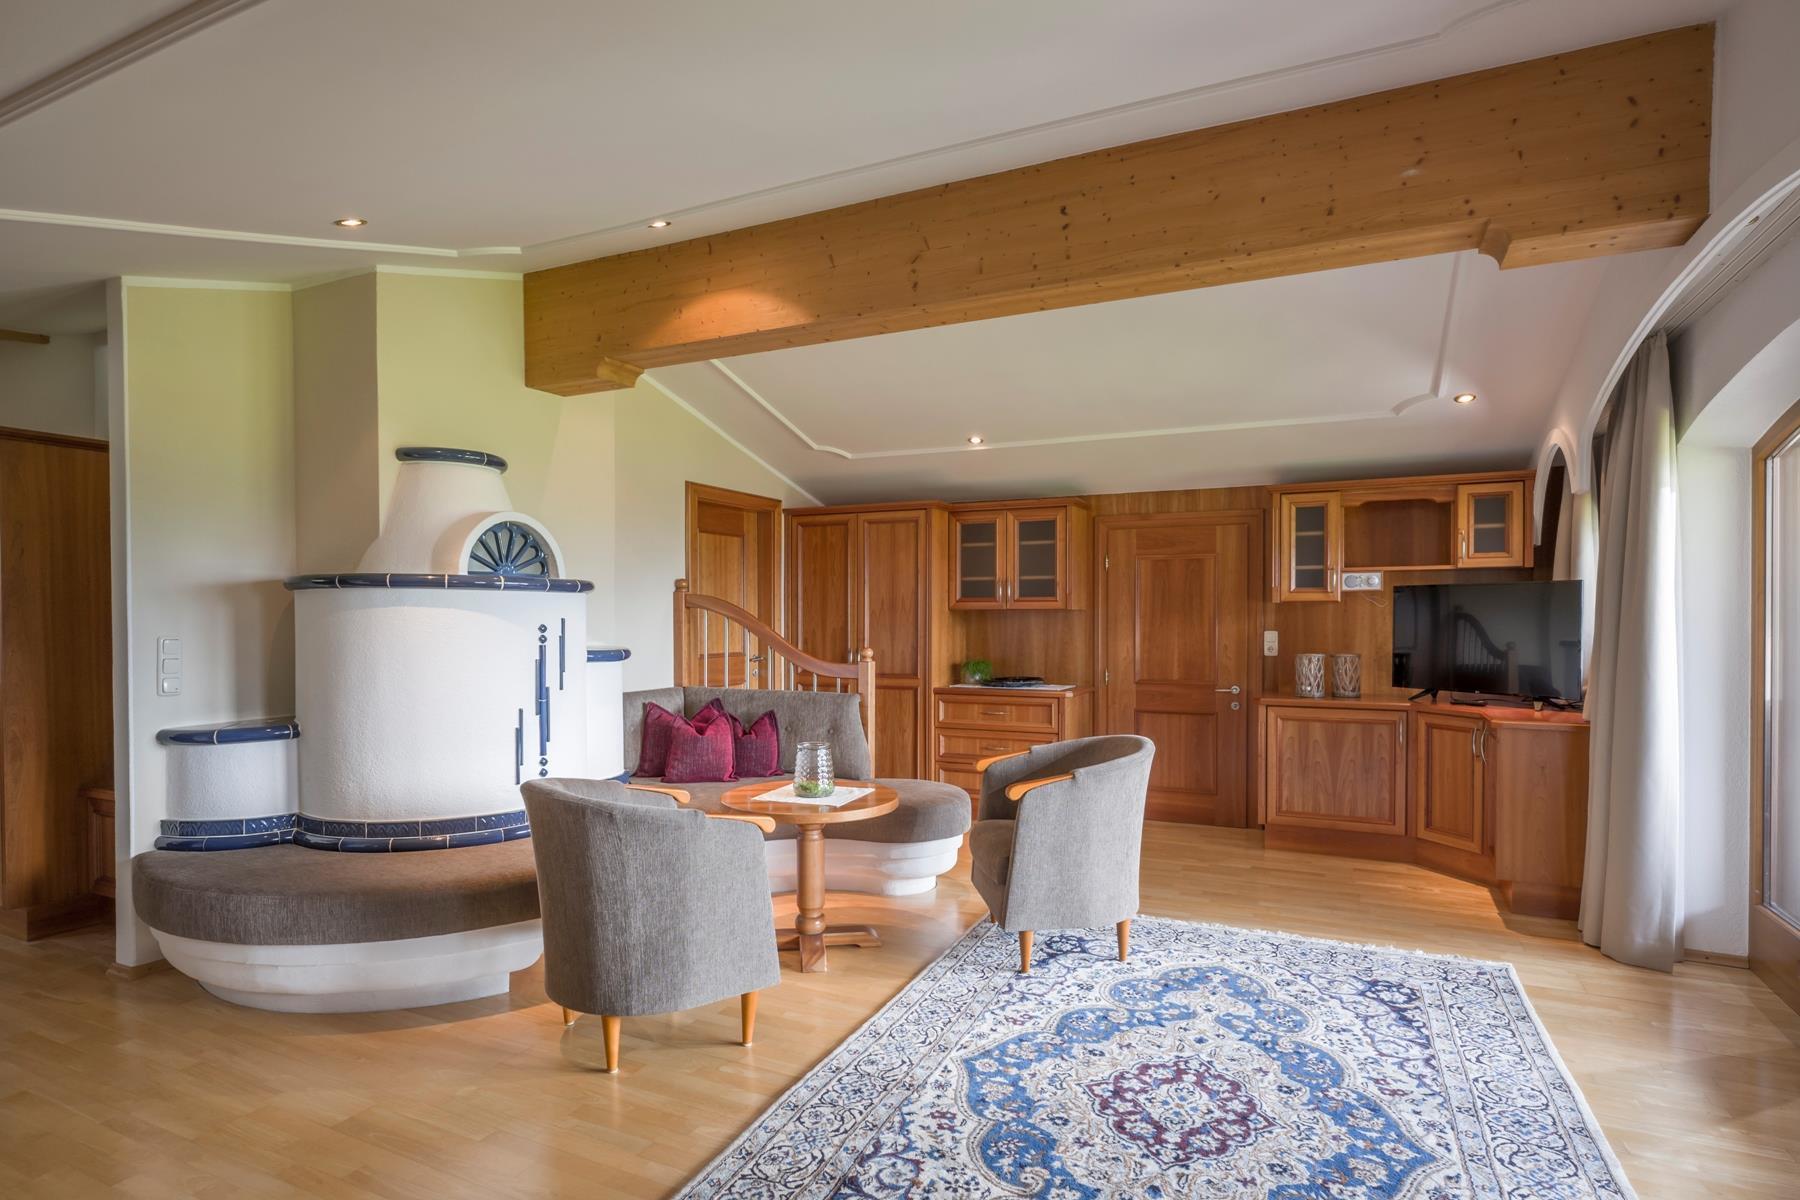 Appartement de vacances Apartments Tirolerhaus Apartment PANORAMA (627214), Kössen, Kaiserwinkl, Tyrol, Autriche, image 40